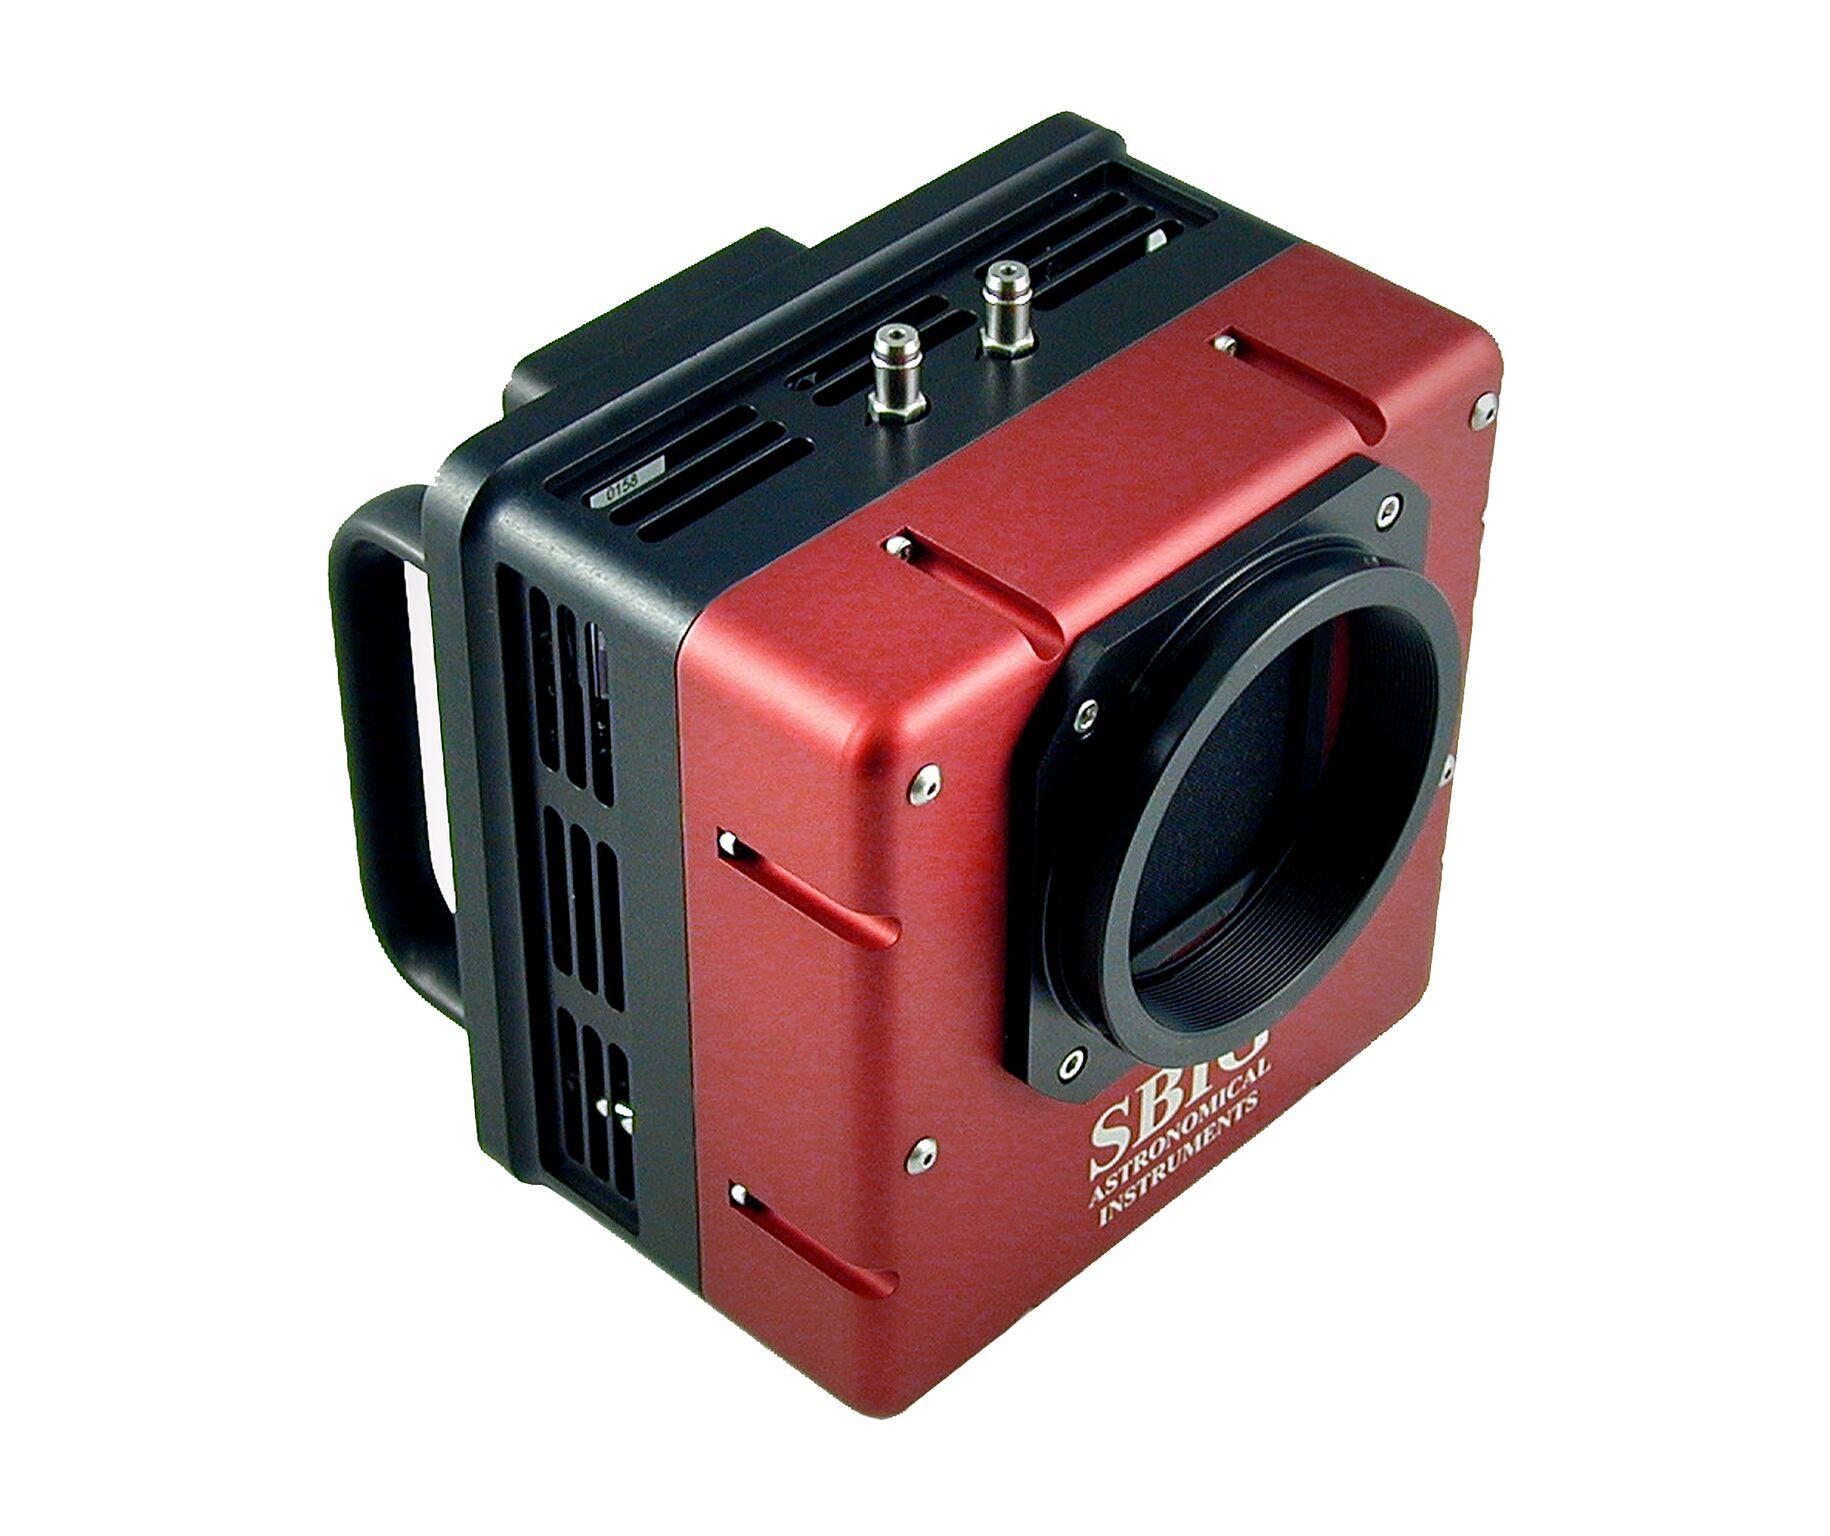 SBIG Cameras